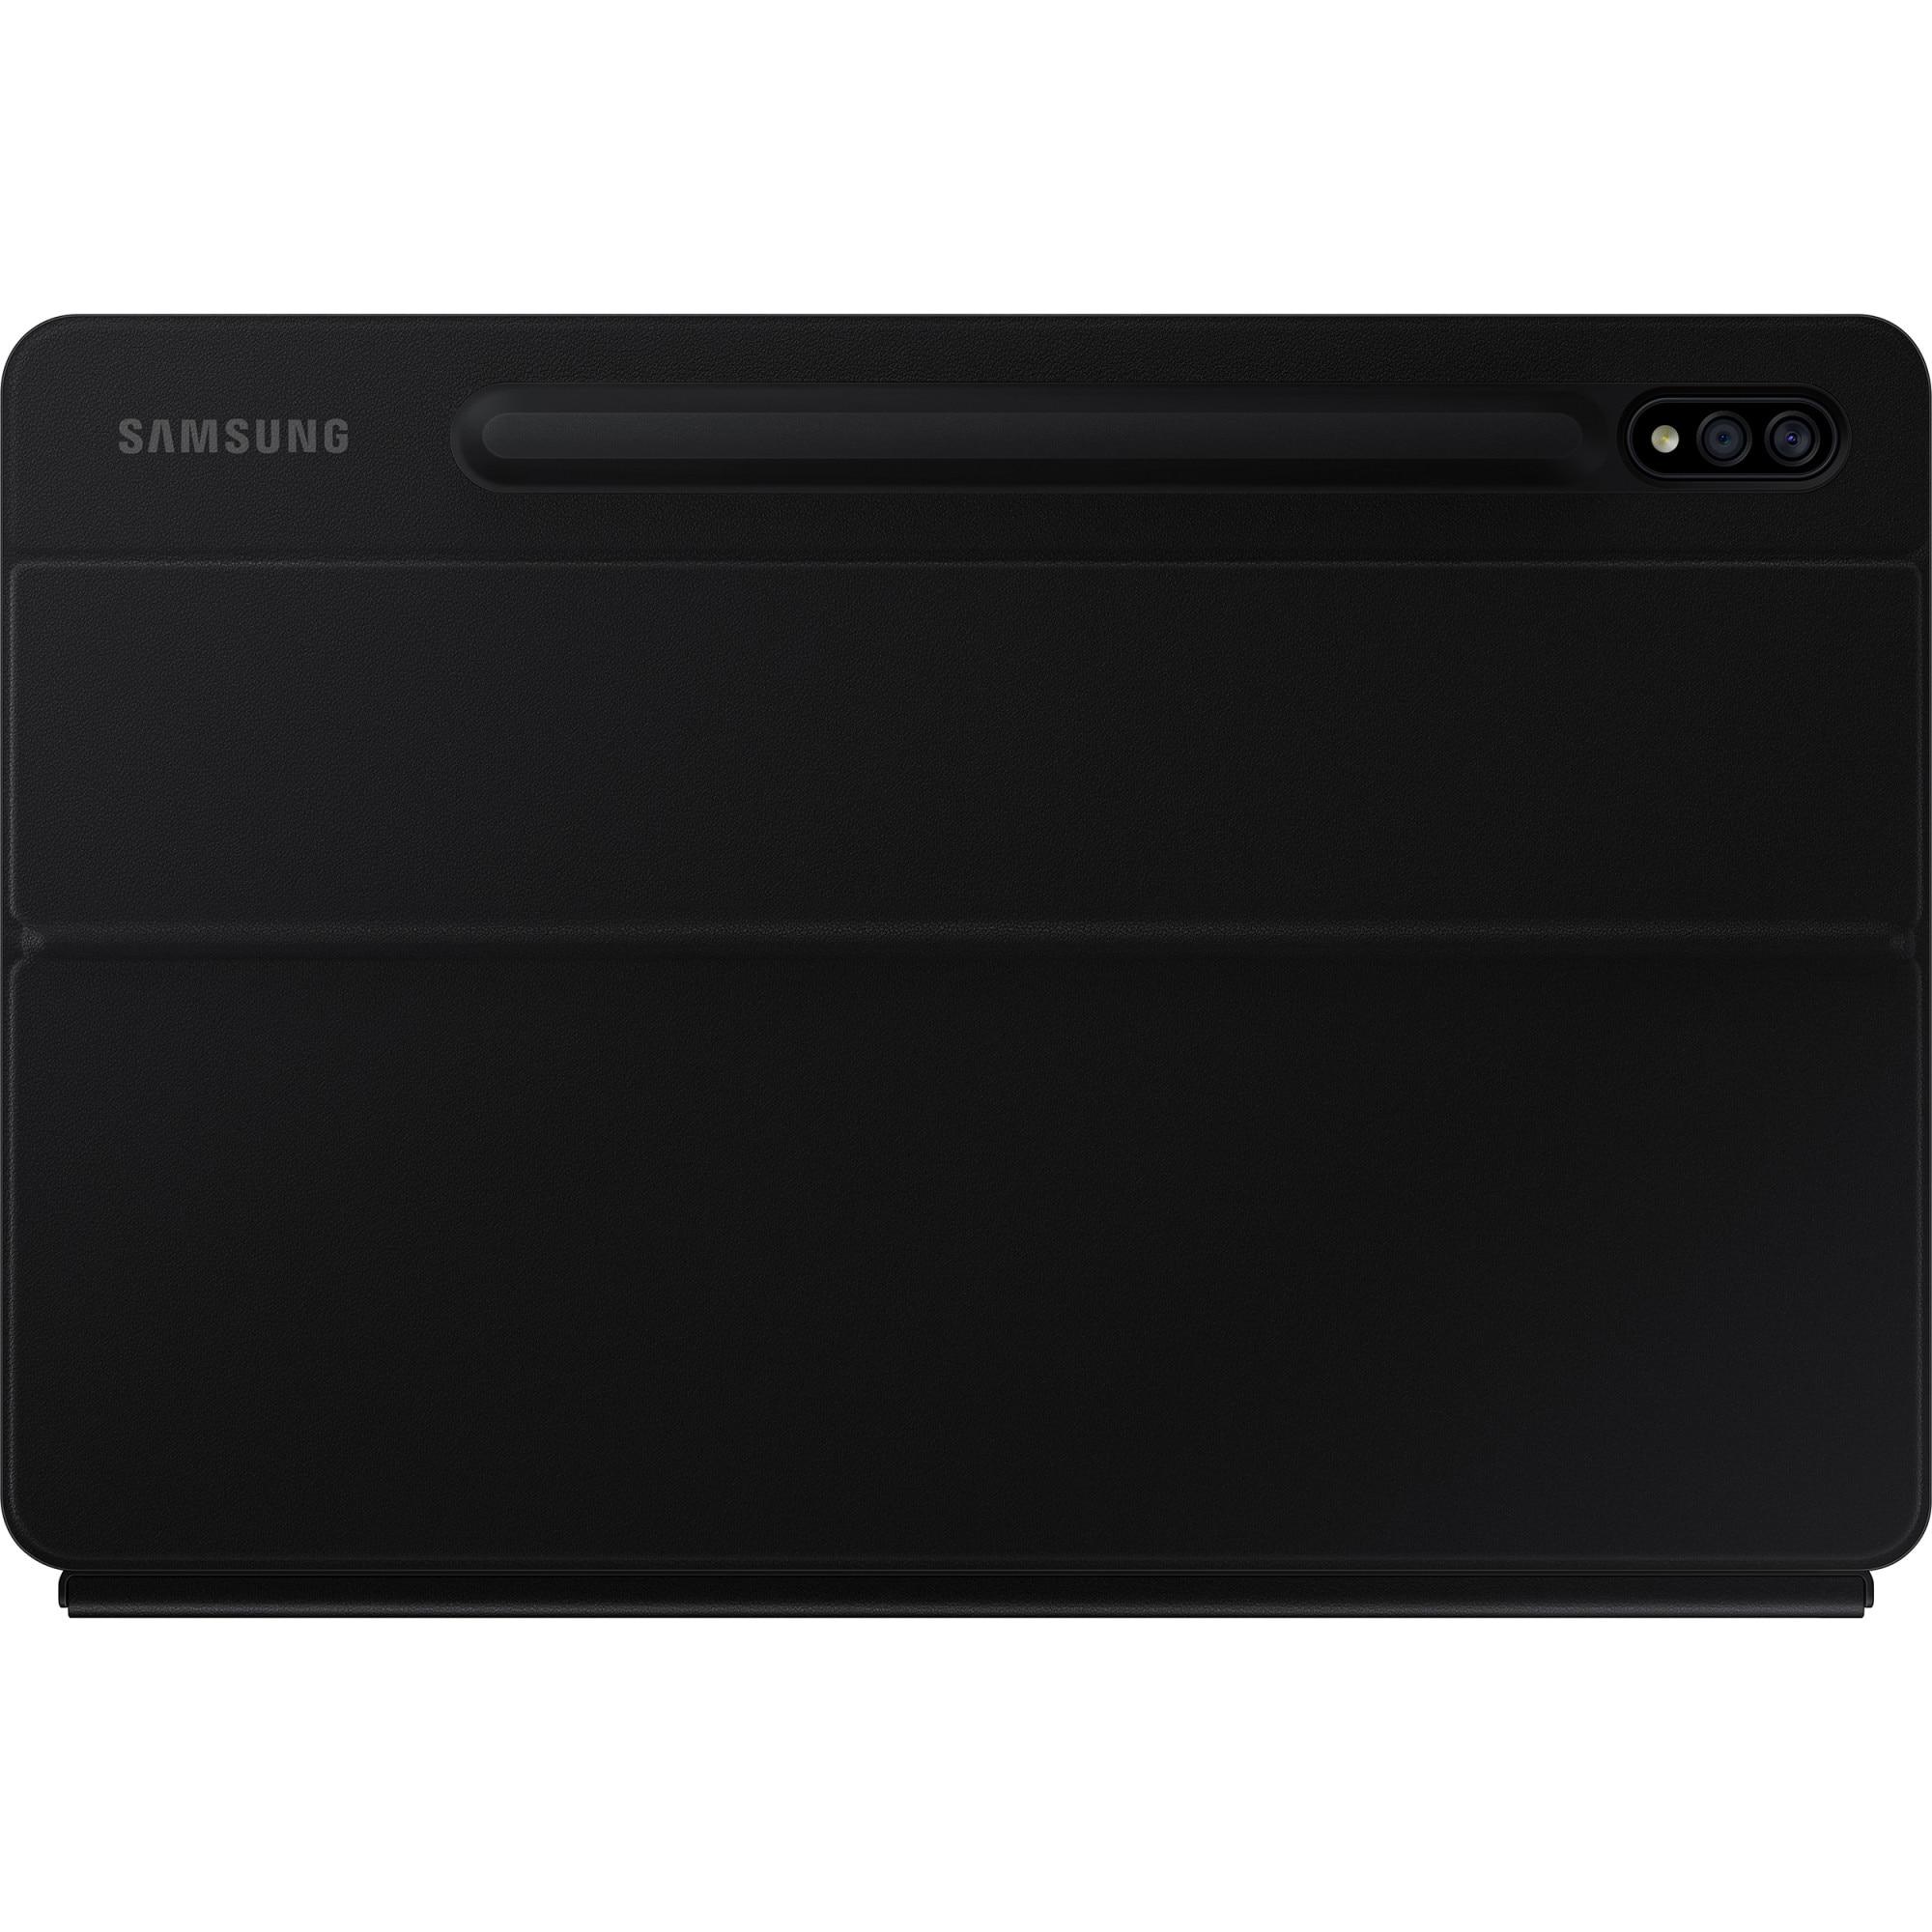 Fotografie Husa de protectie Samsung Bookcover Keyboard pentru Galaxy Tab S7, Black